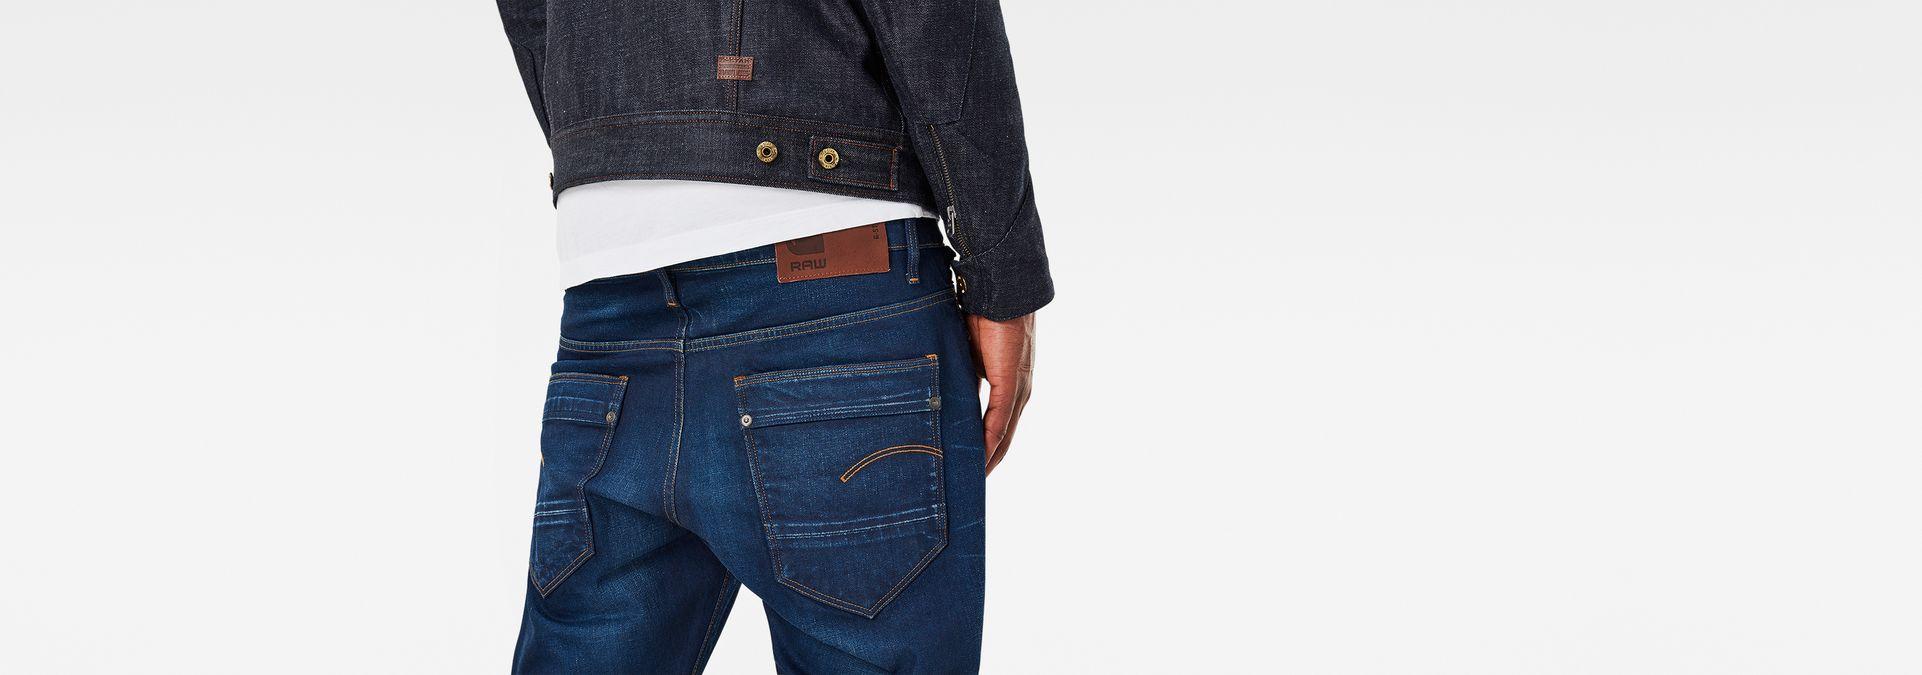 hedrove tapered jeans medium aged men sale g star raw. Black Bedroom Furniture Sets. Home Design Ideas